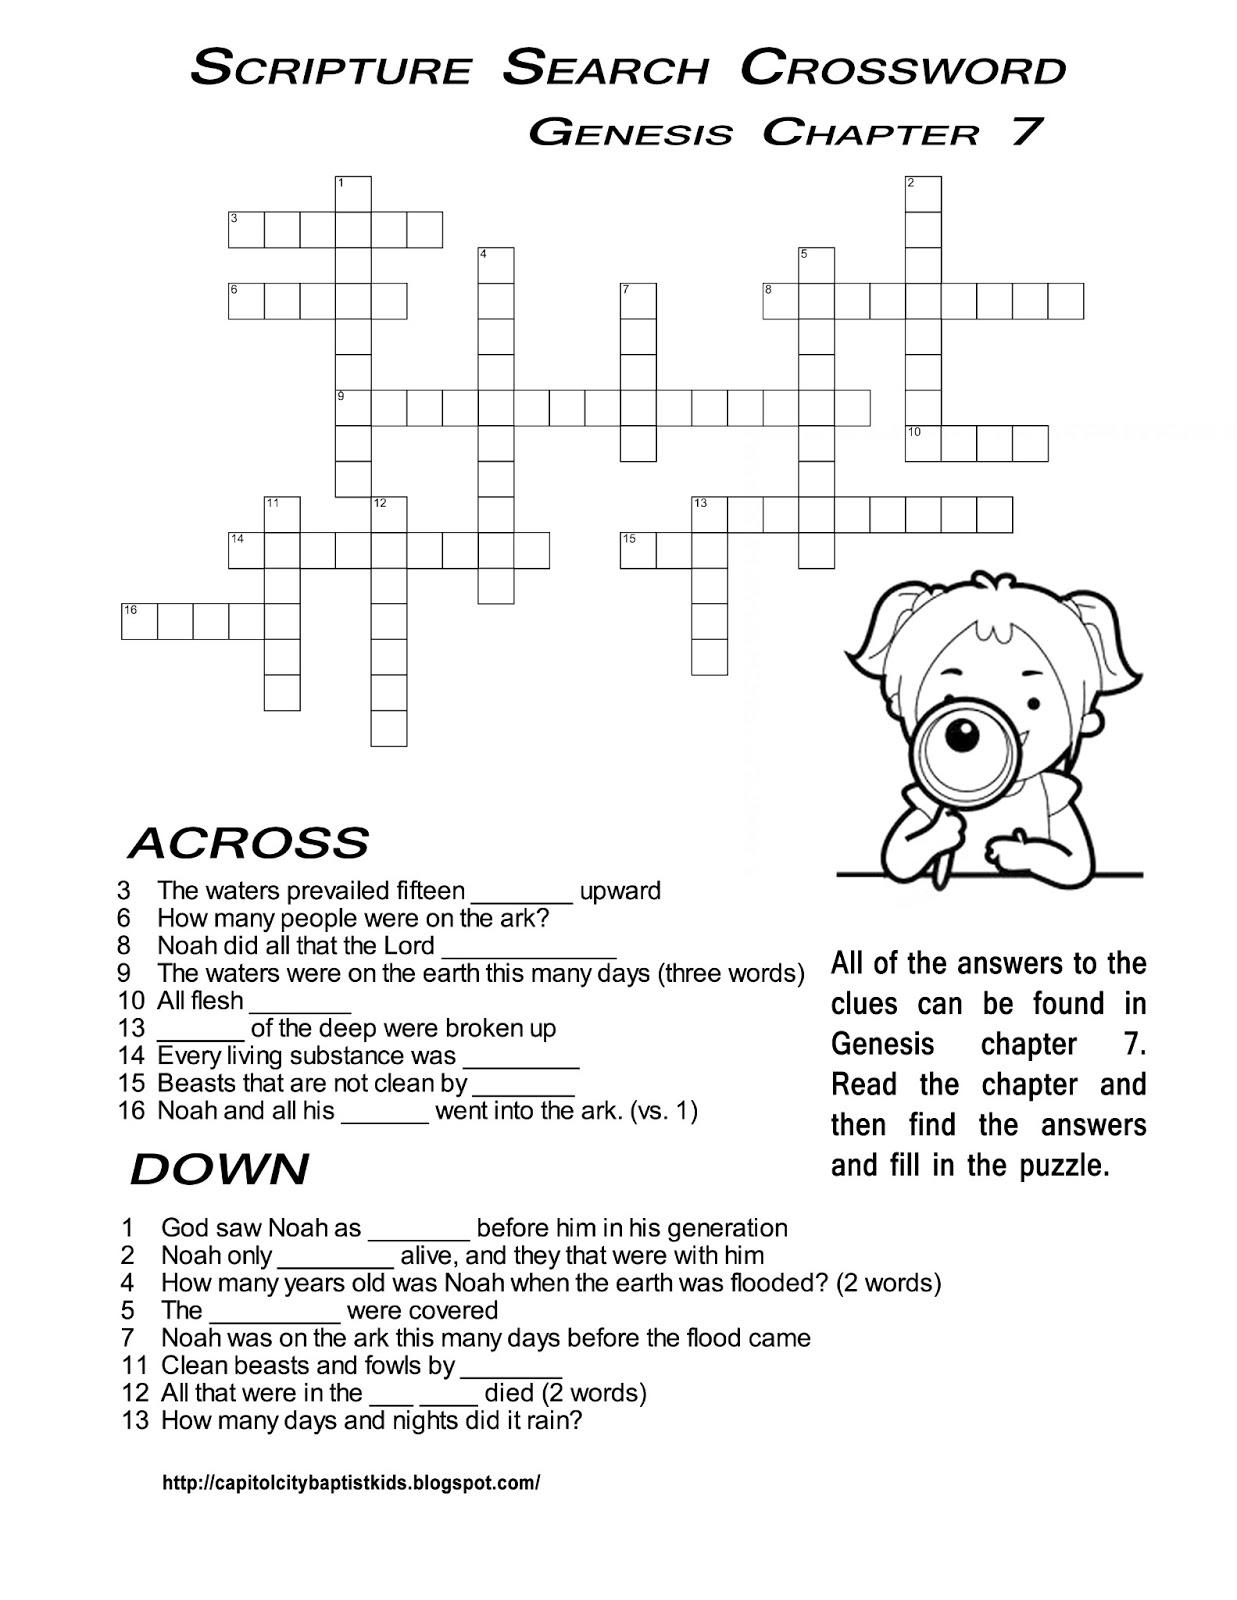 Ccbc Kids Corner: Scripture Search Crossword #2 - Printable Crossword #4